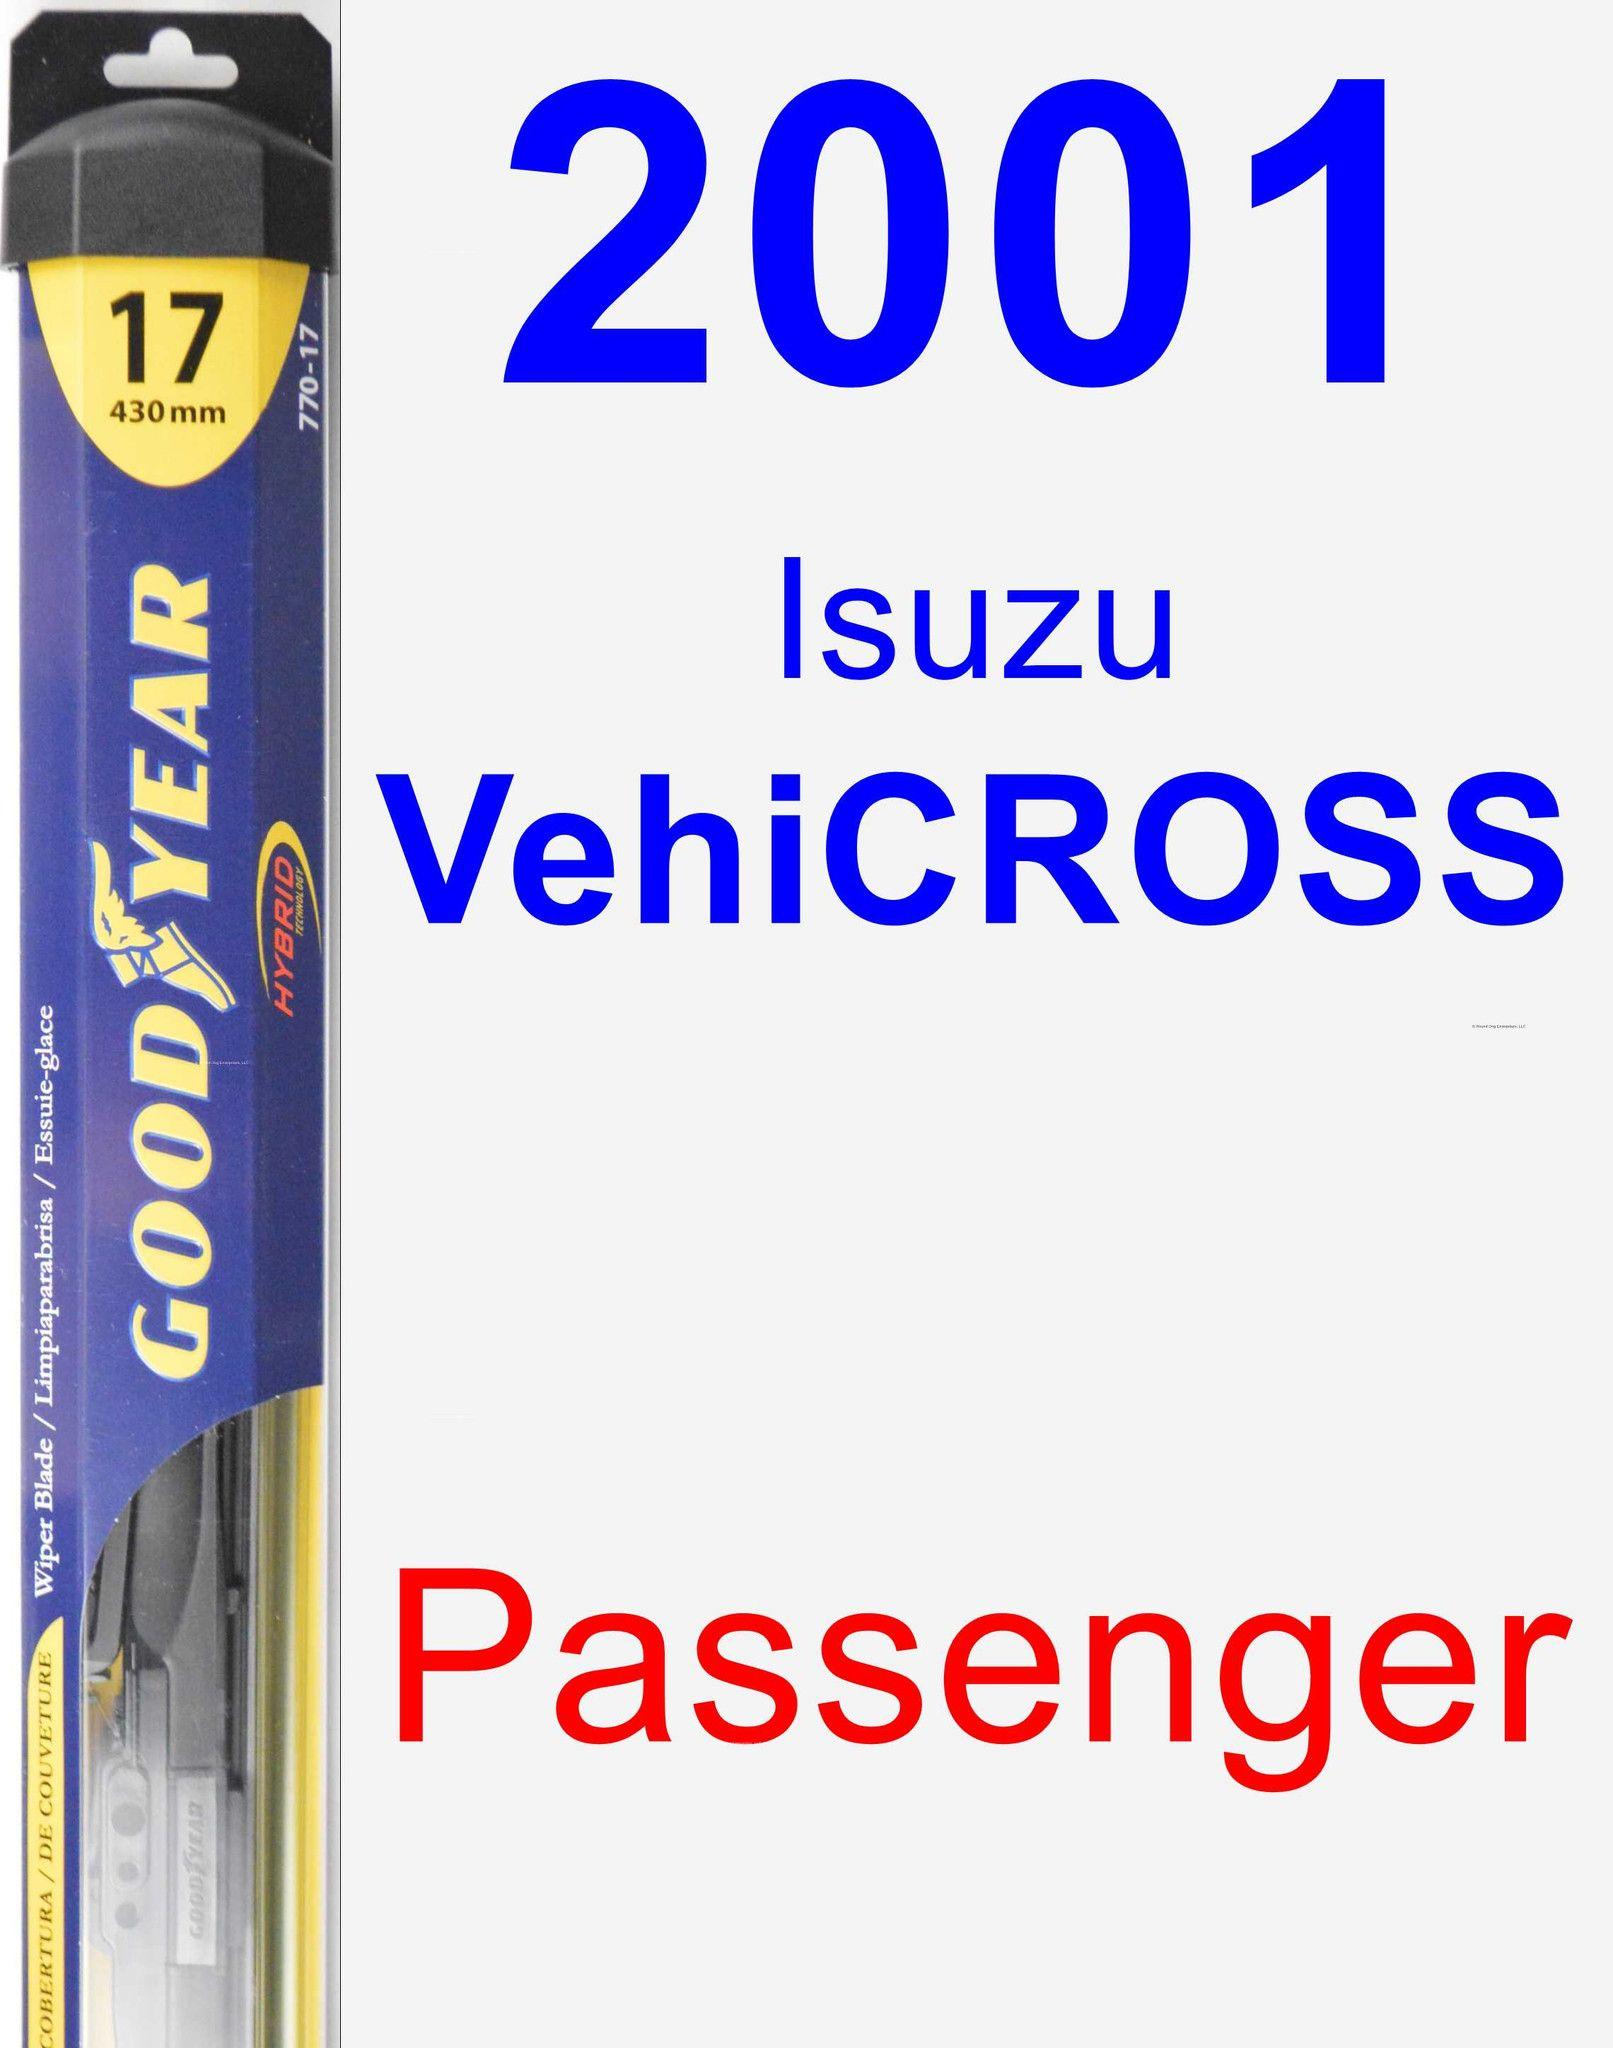 Passenger Wiper Blade for 2001 Isuzu VehiCROSS - Hybrid